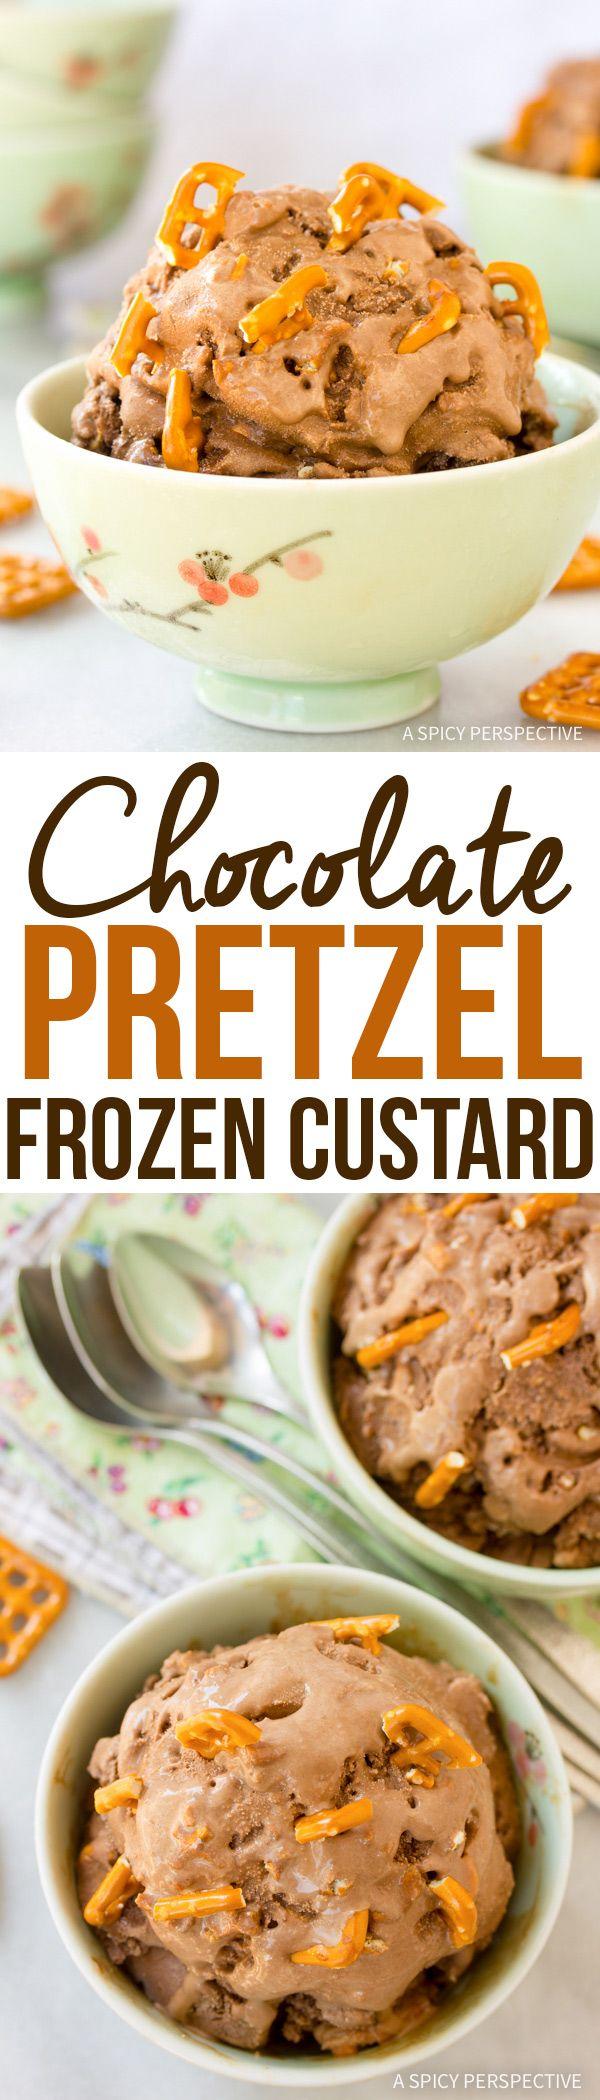 Salty-Sweet Chocolate Pretzel Frozen Custard Recipe #icecream #summer via @spicyperspectiv